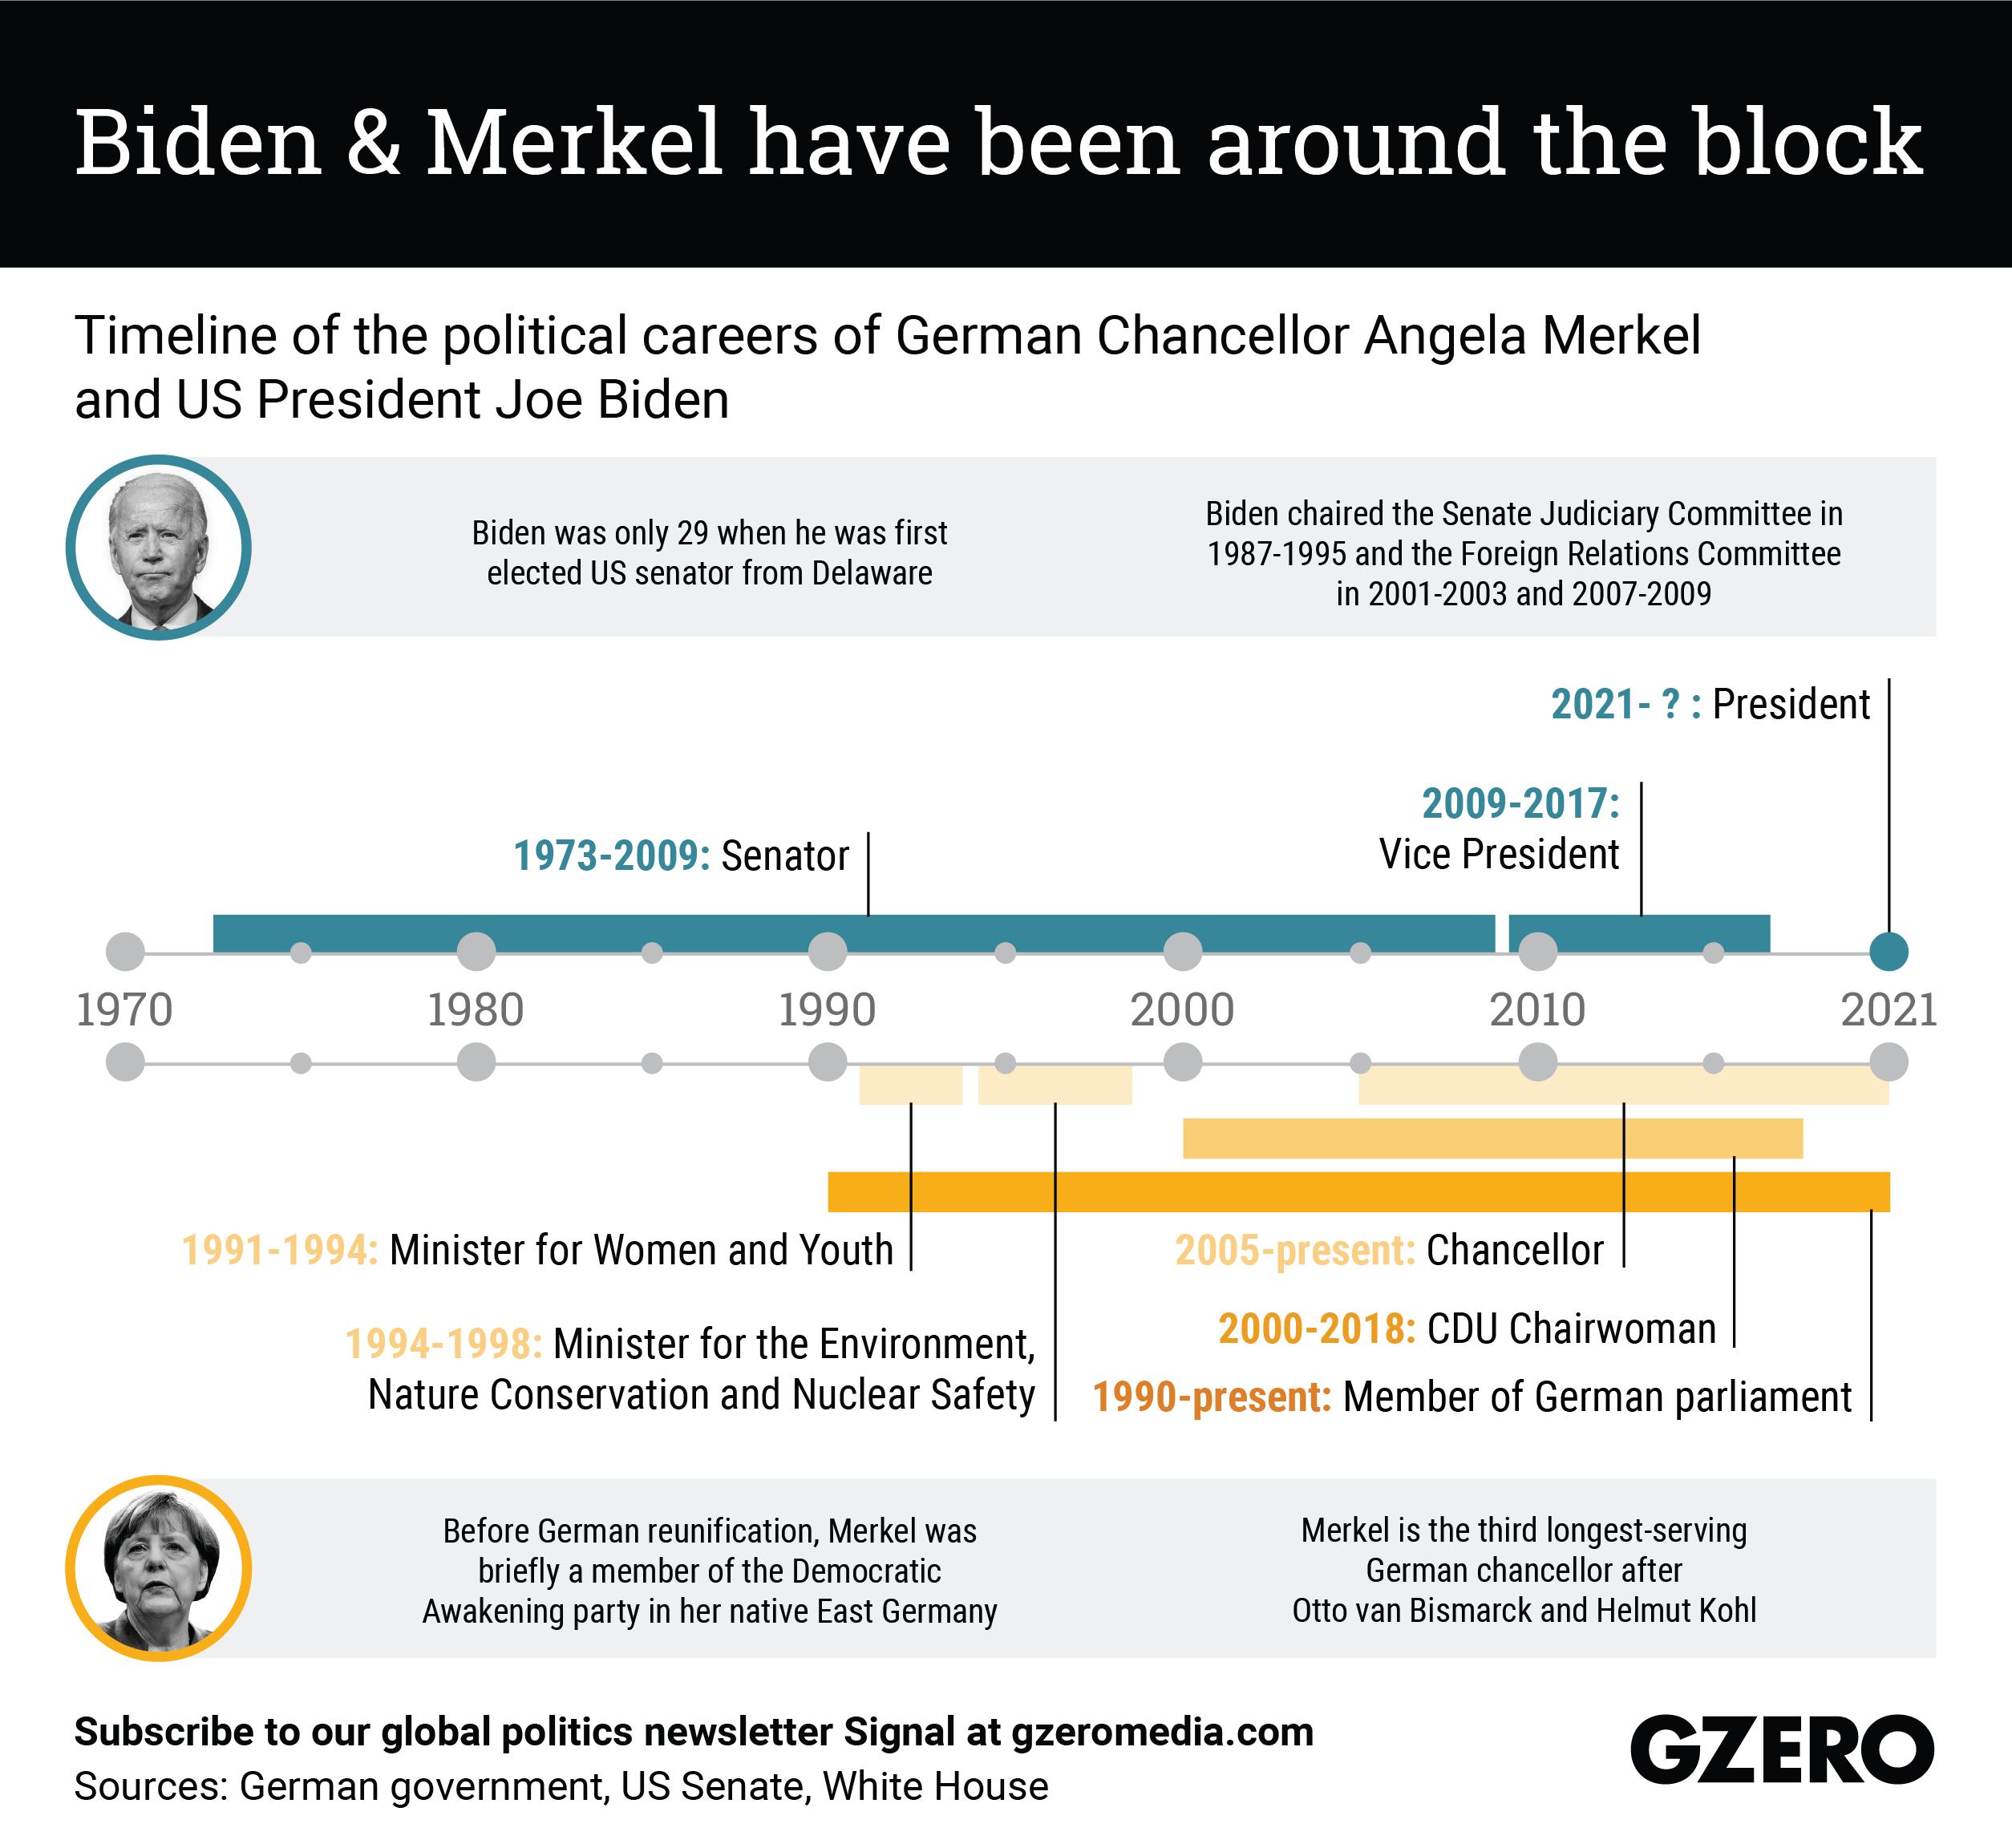 The Graphic Truth: Biden & Merkel have been around the block